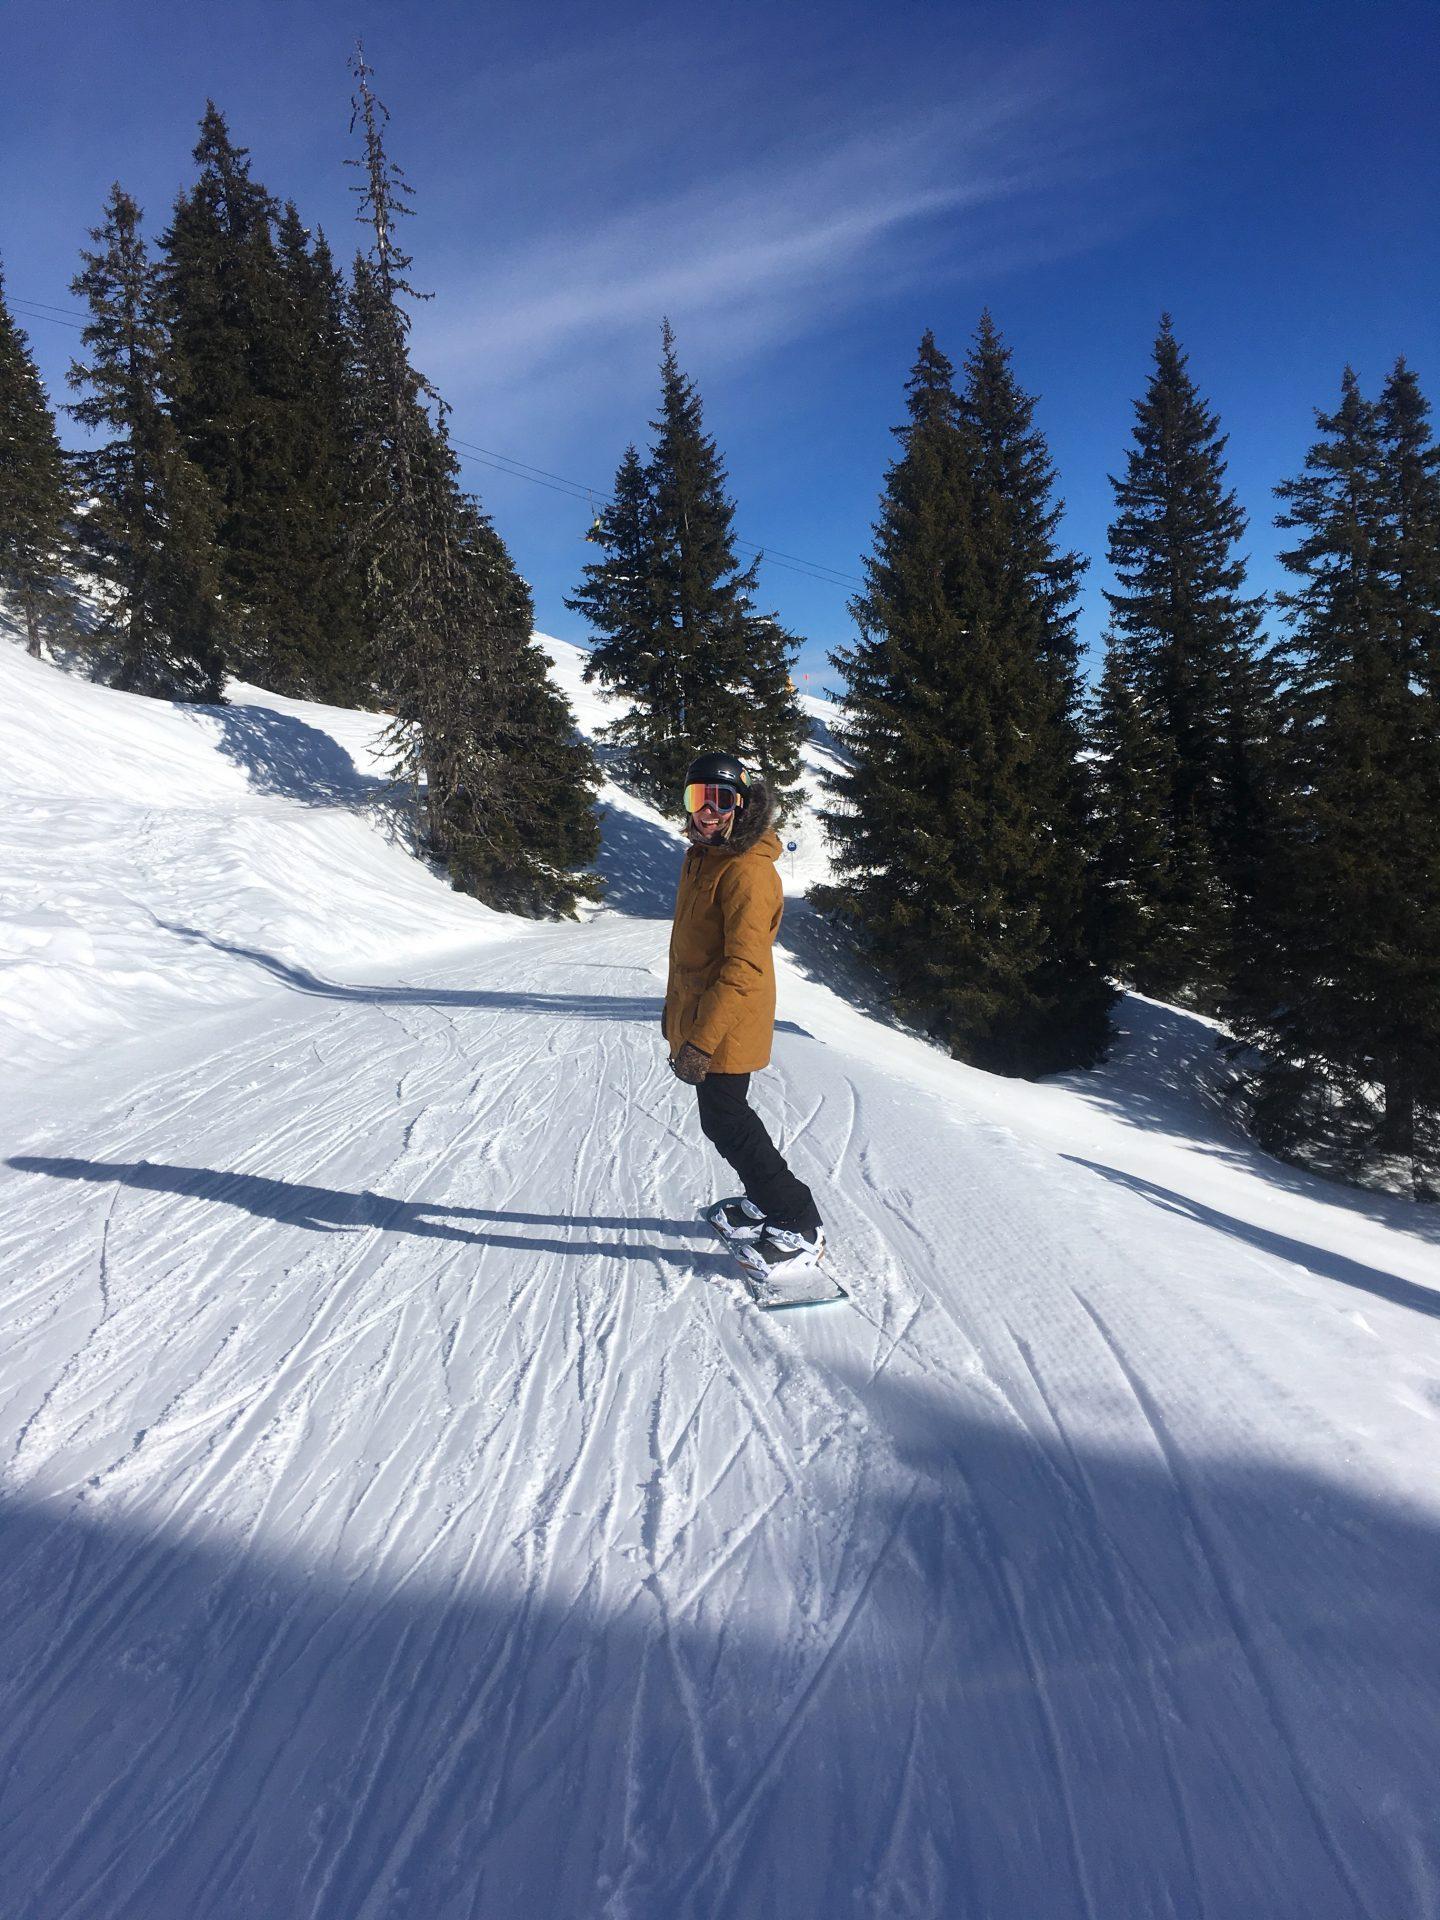 Skigebiet-Alpbachtal-Wildschönau-Ski-Juwel-Snowboarding-Mari-Sandner-1440x1920